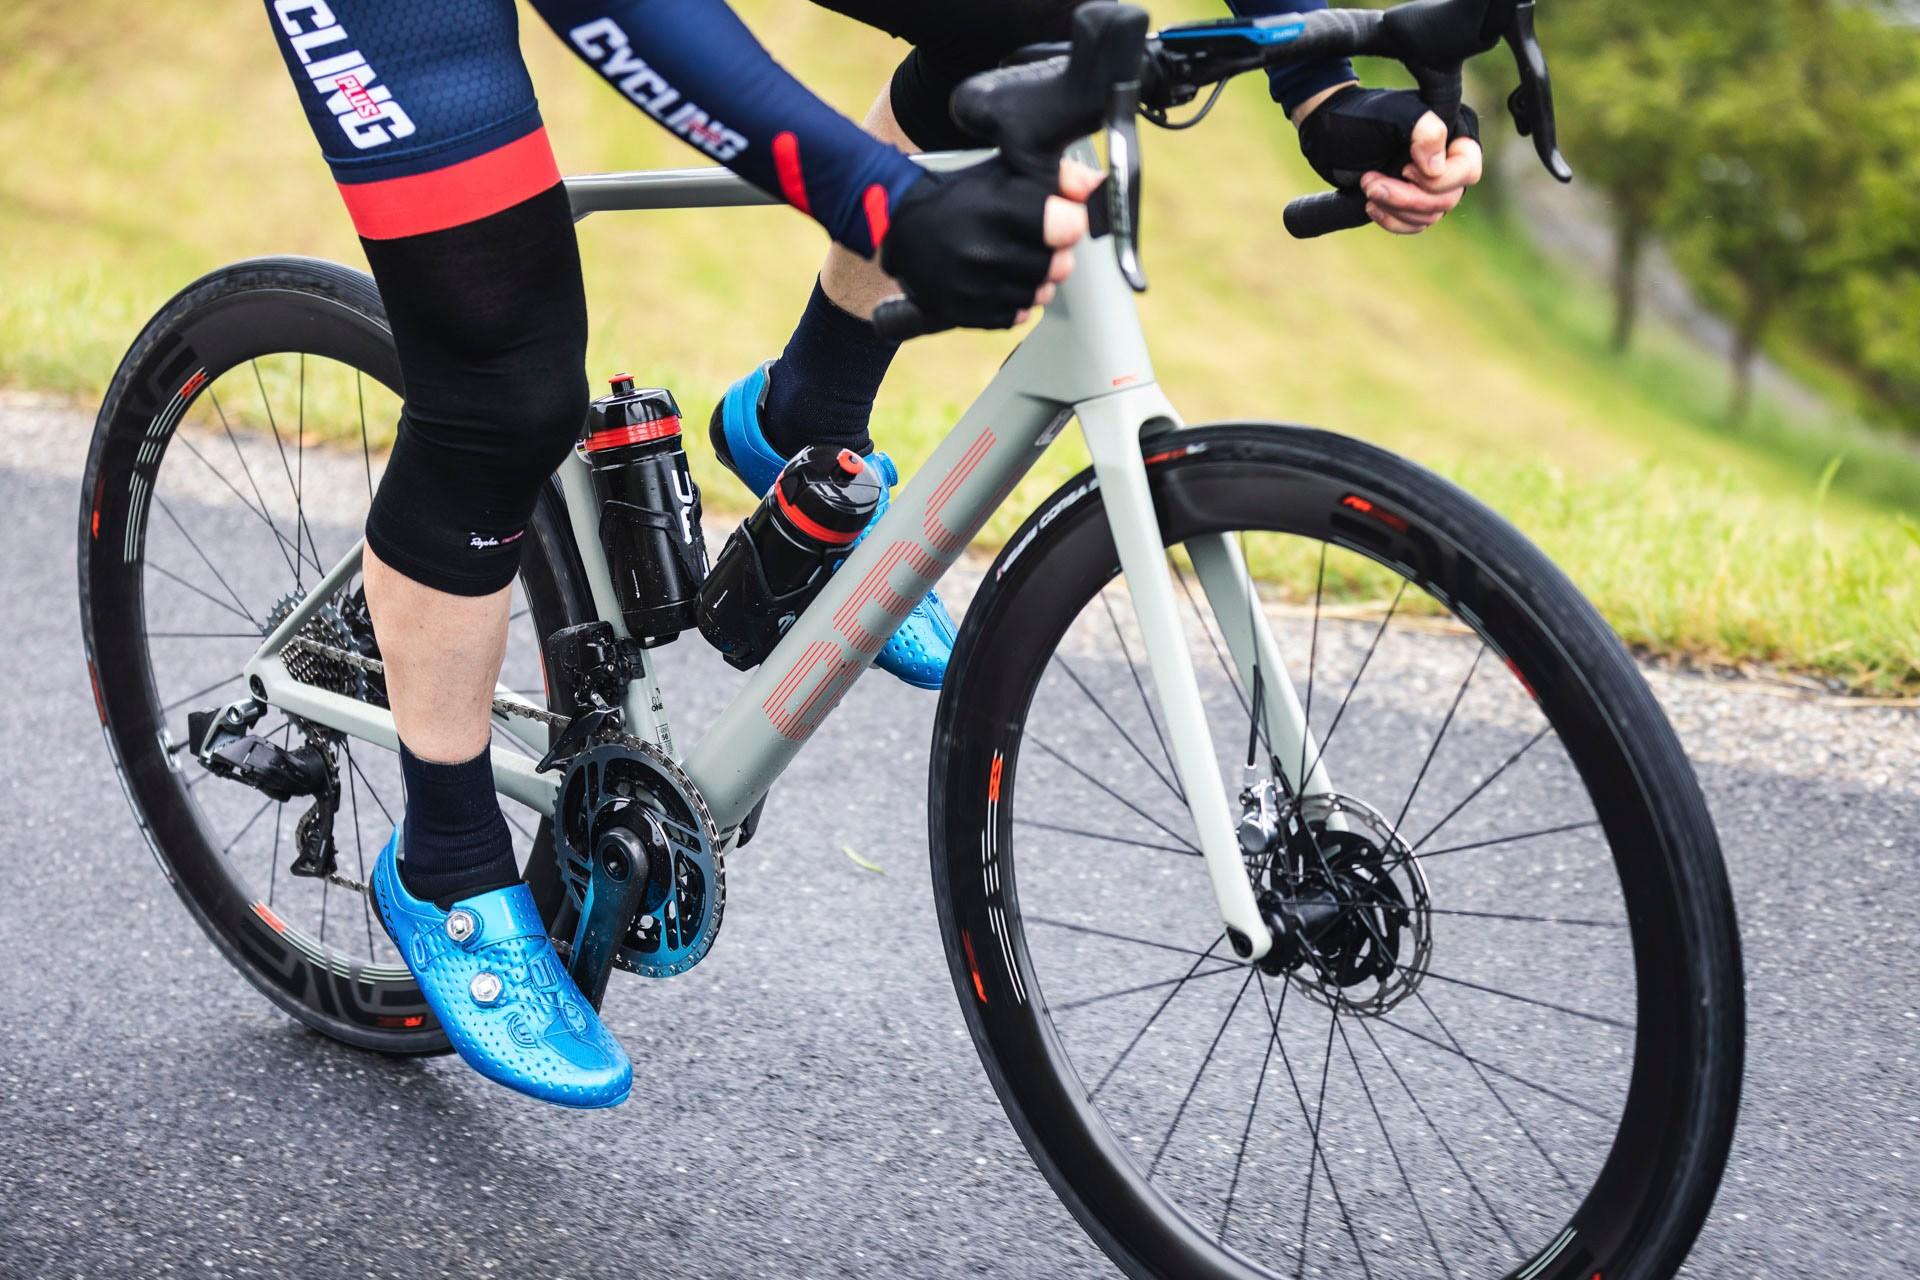 Male cyclist riding road bike